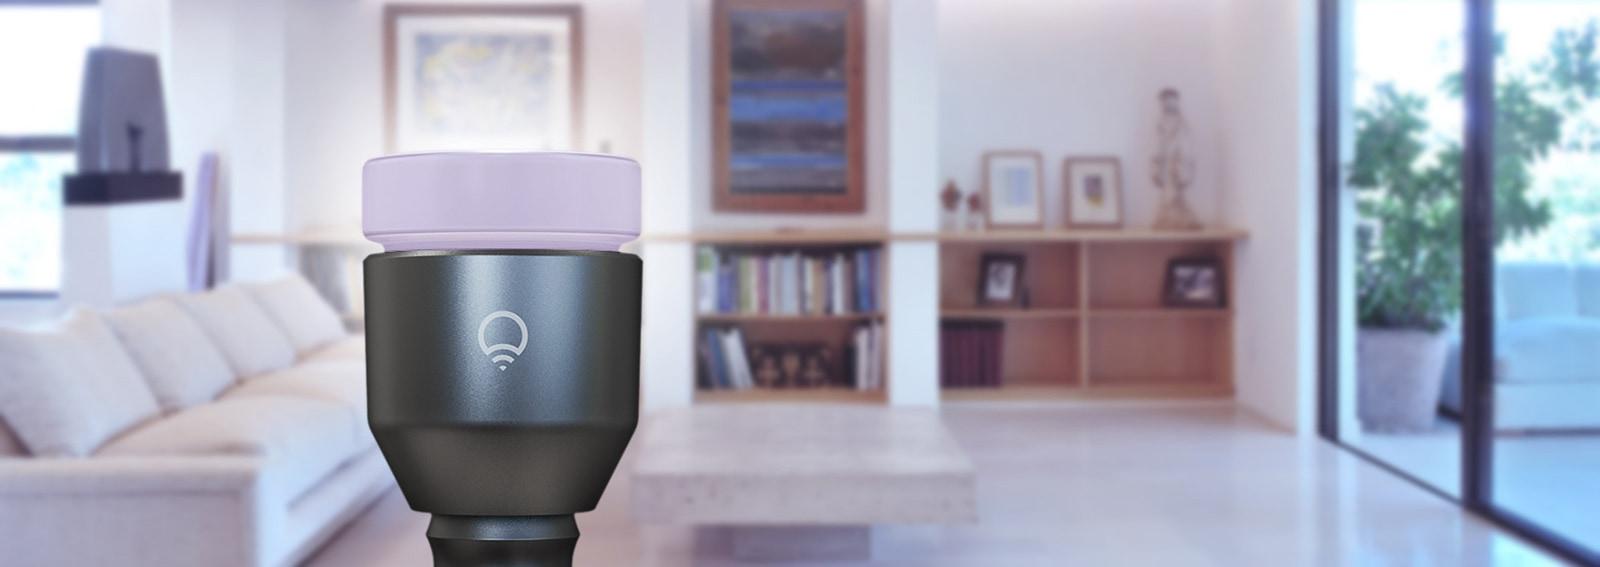 Cover-lampade-smartphone-desktop